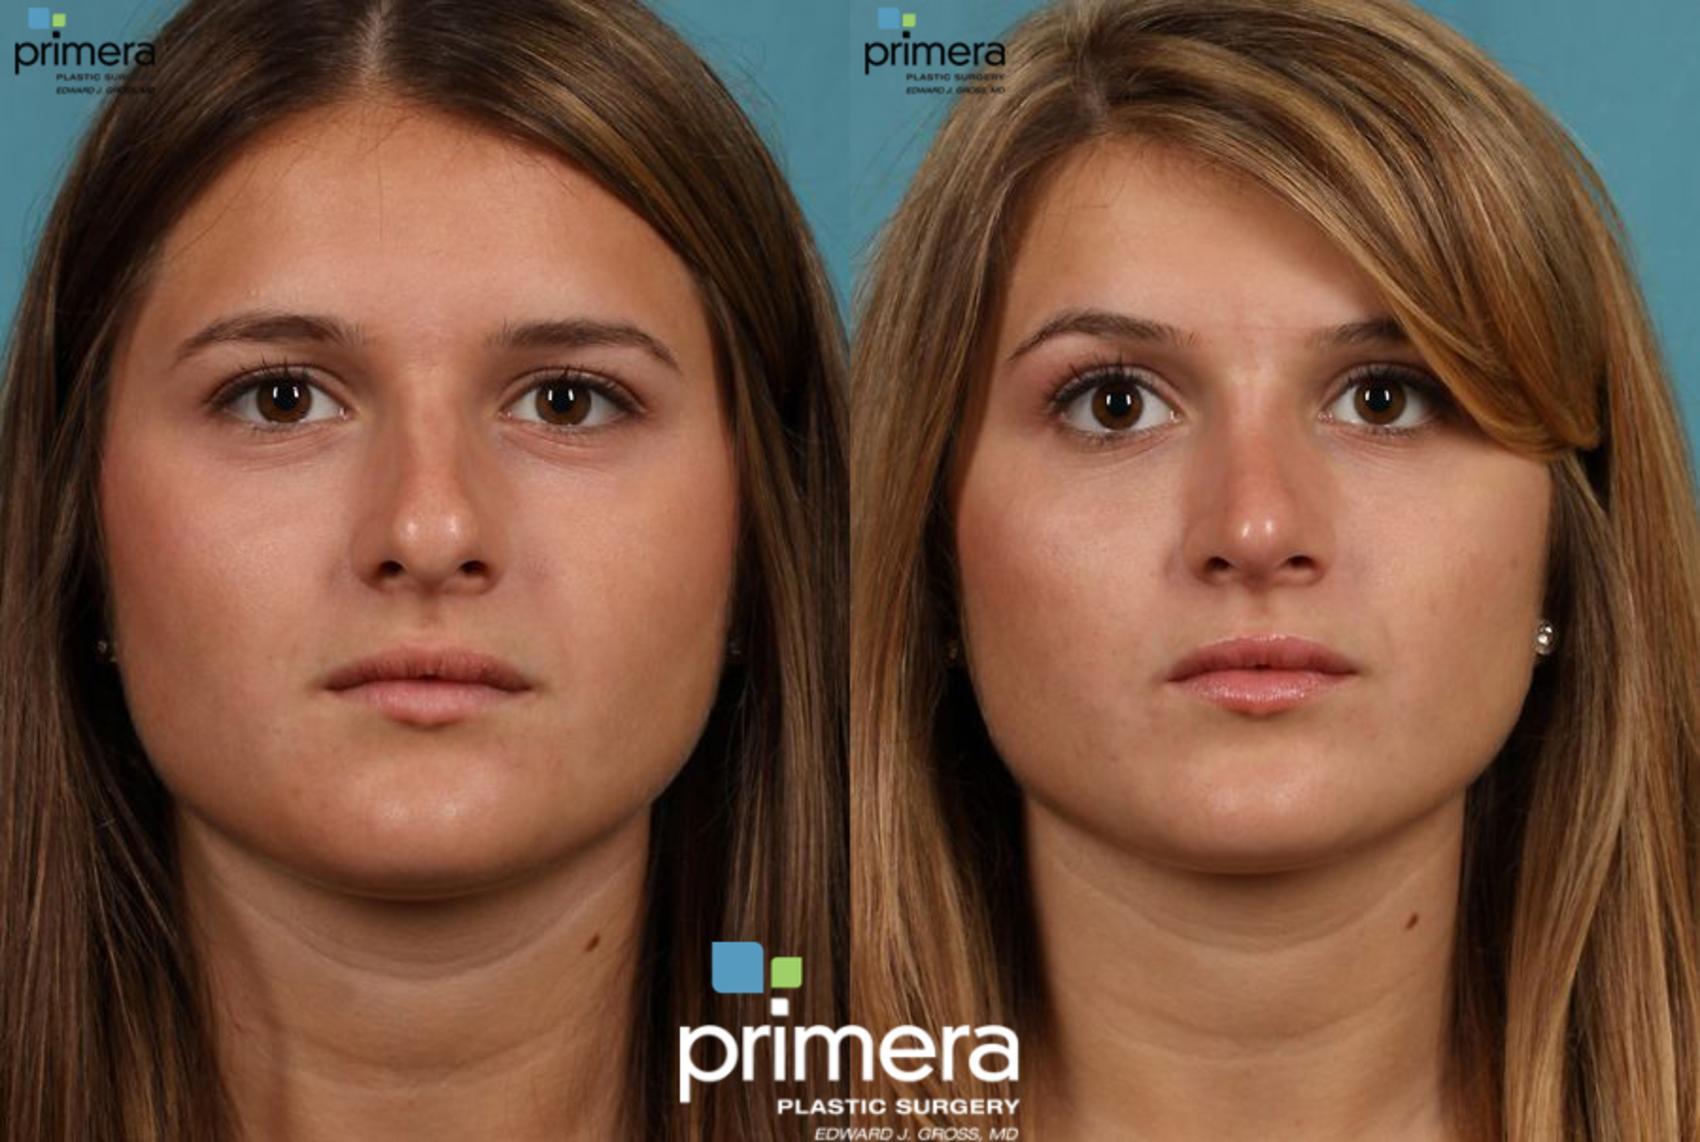 Rhinoplasty Before After Photos Patient 9 Orlando Florida Primera Plastic Surgery